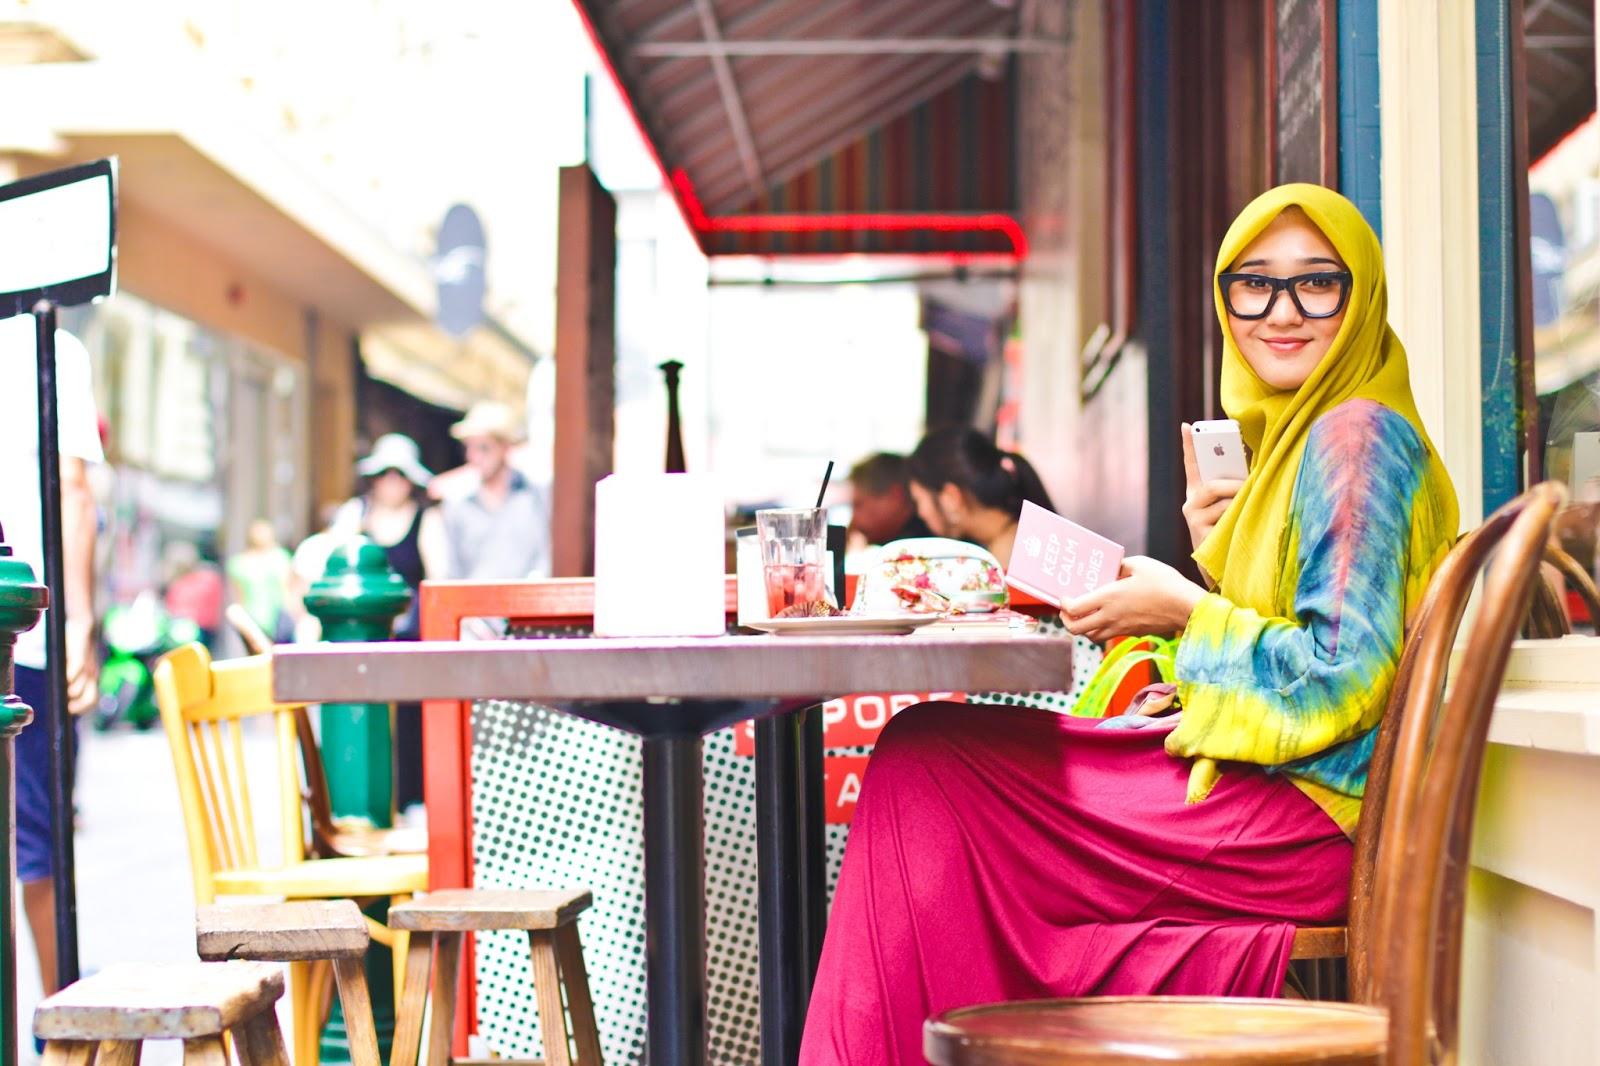 Model Hijab Tahun 2014 Info Cewek/page/268 | Star Travel International ...